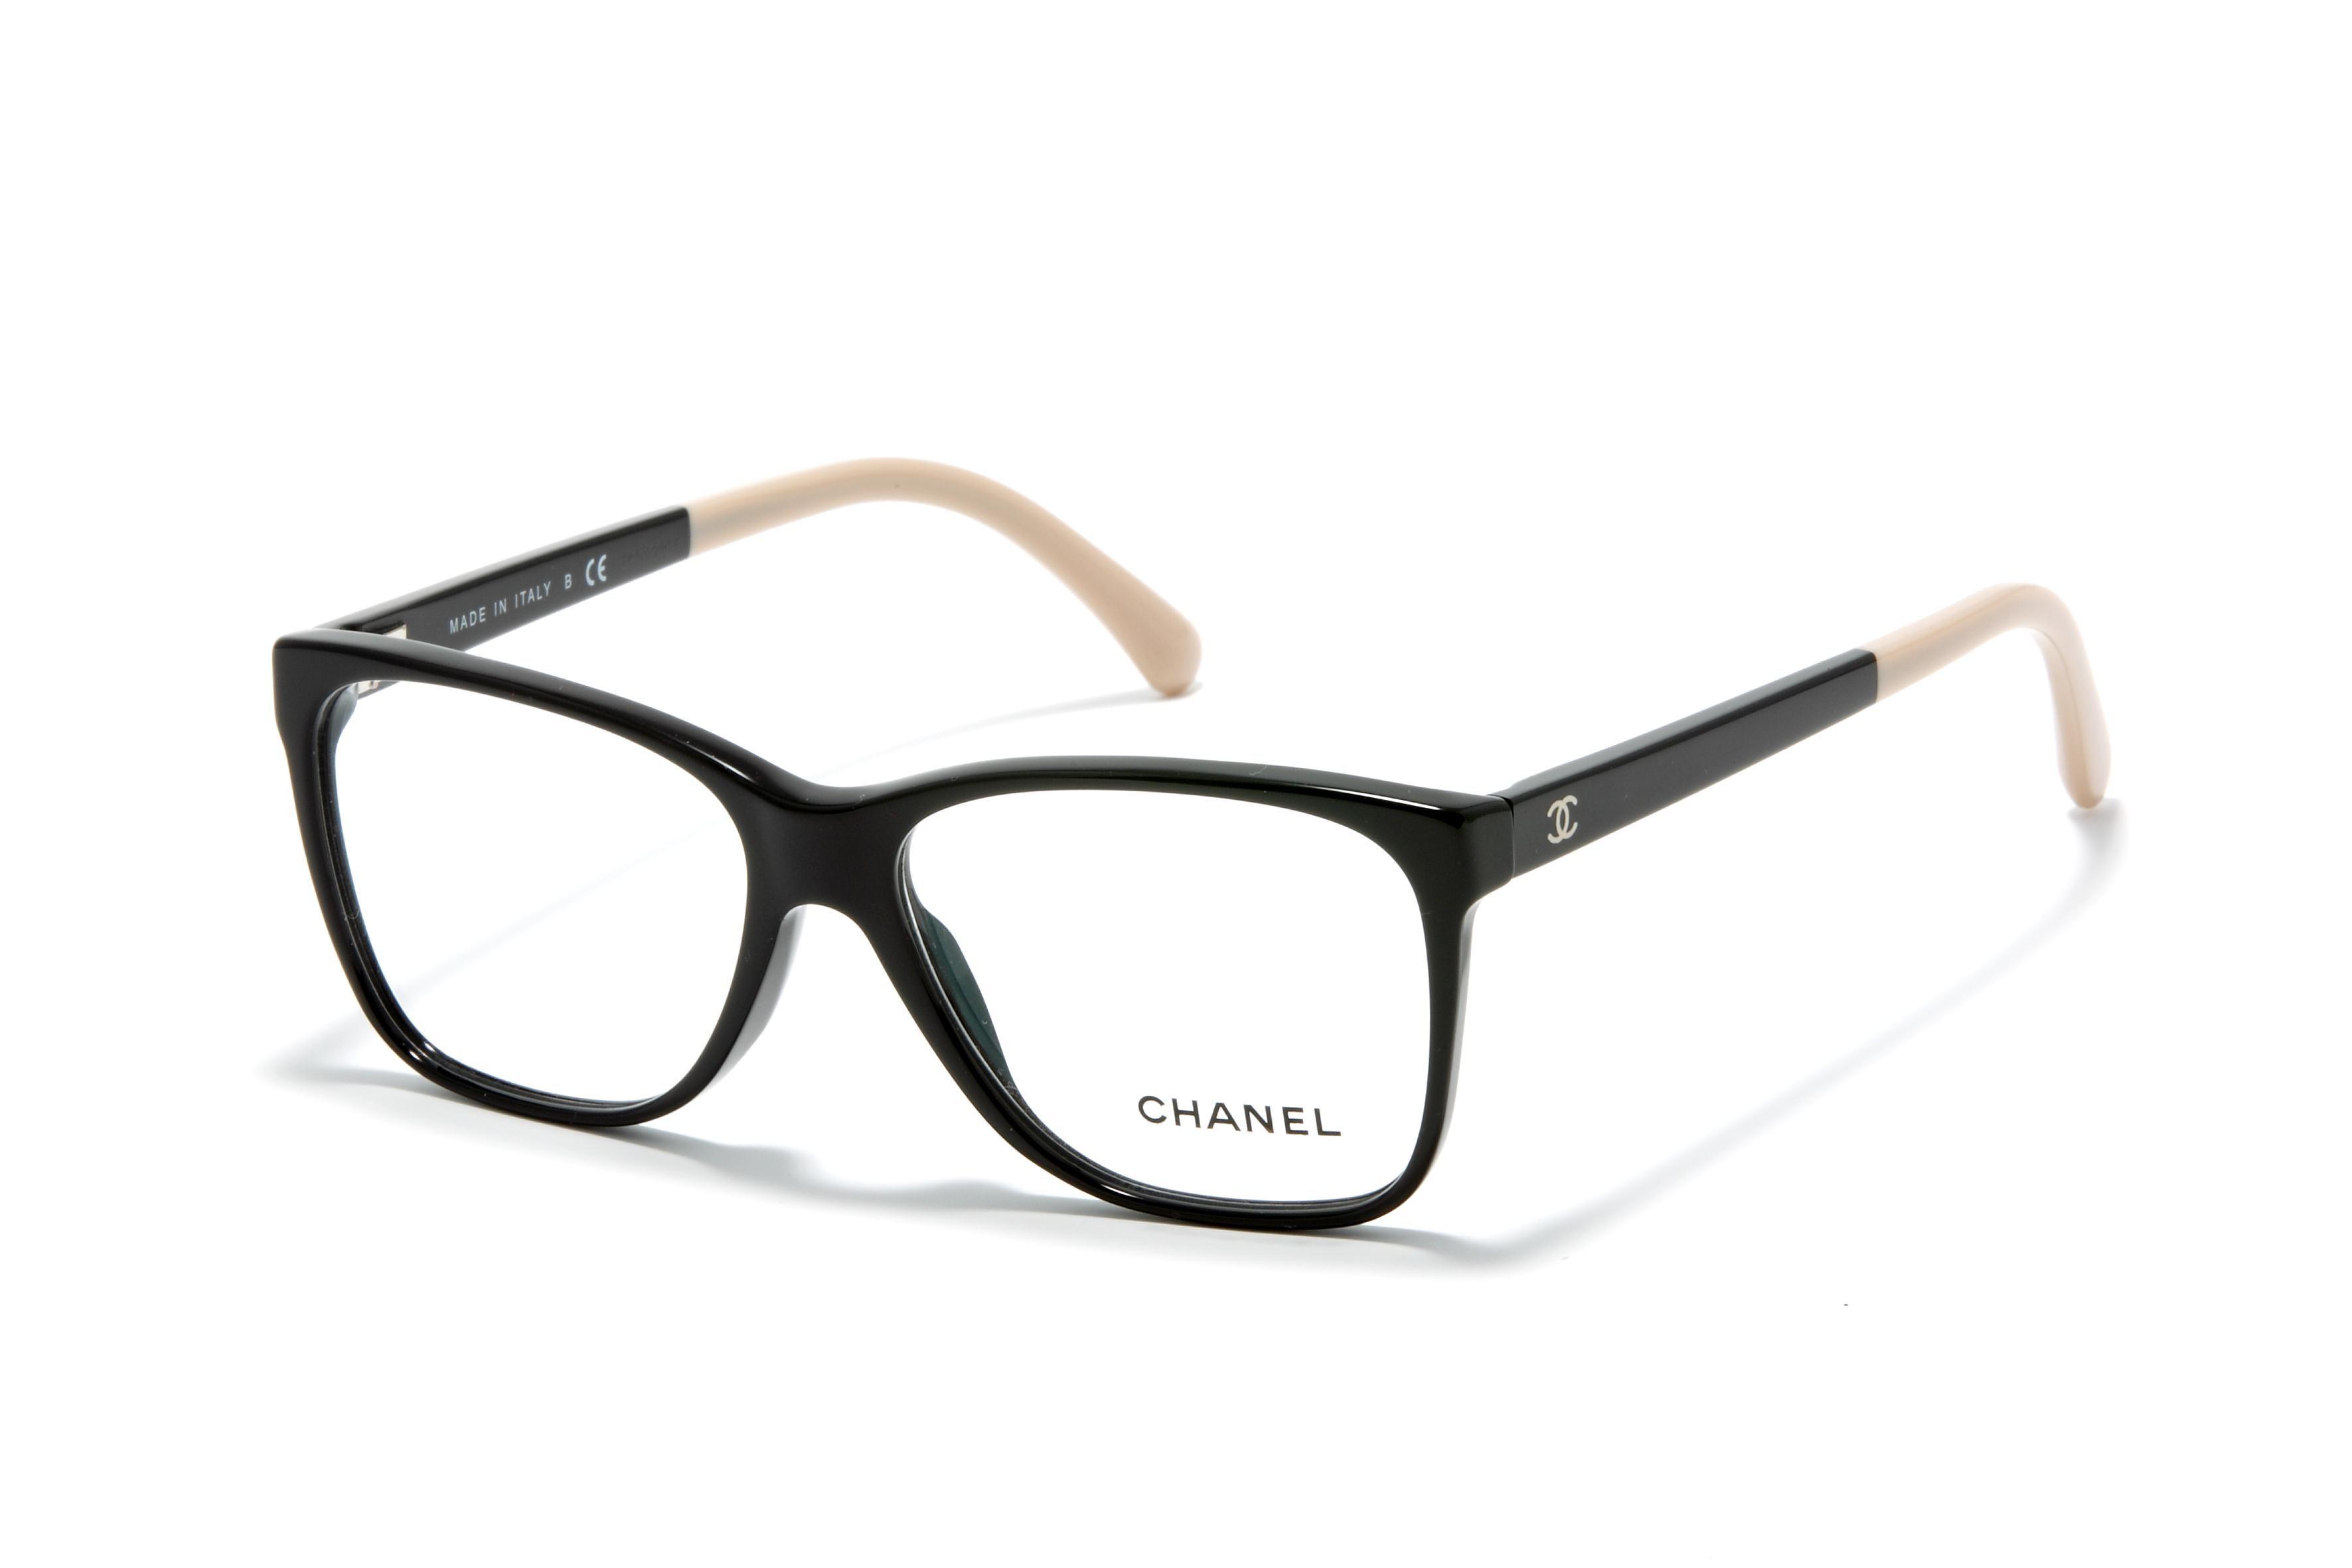 ec6dcde1f90 Chanel Optical Glasses Frames